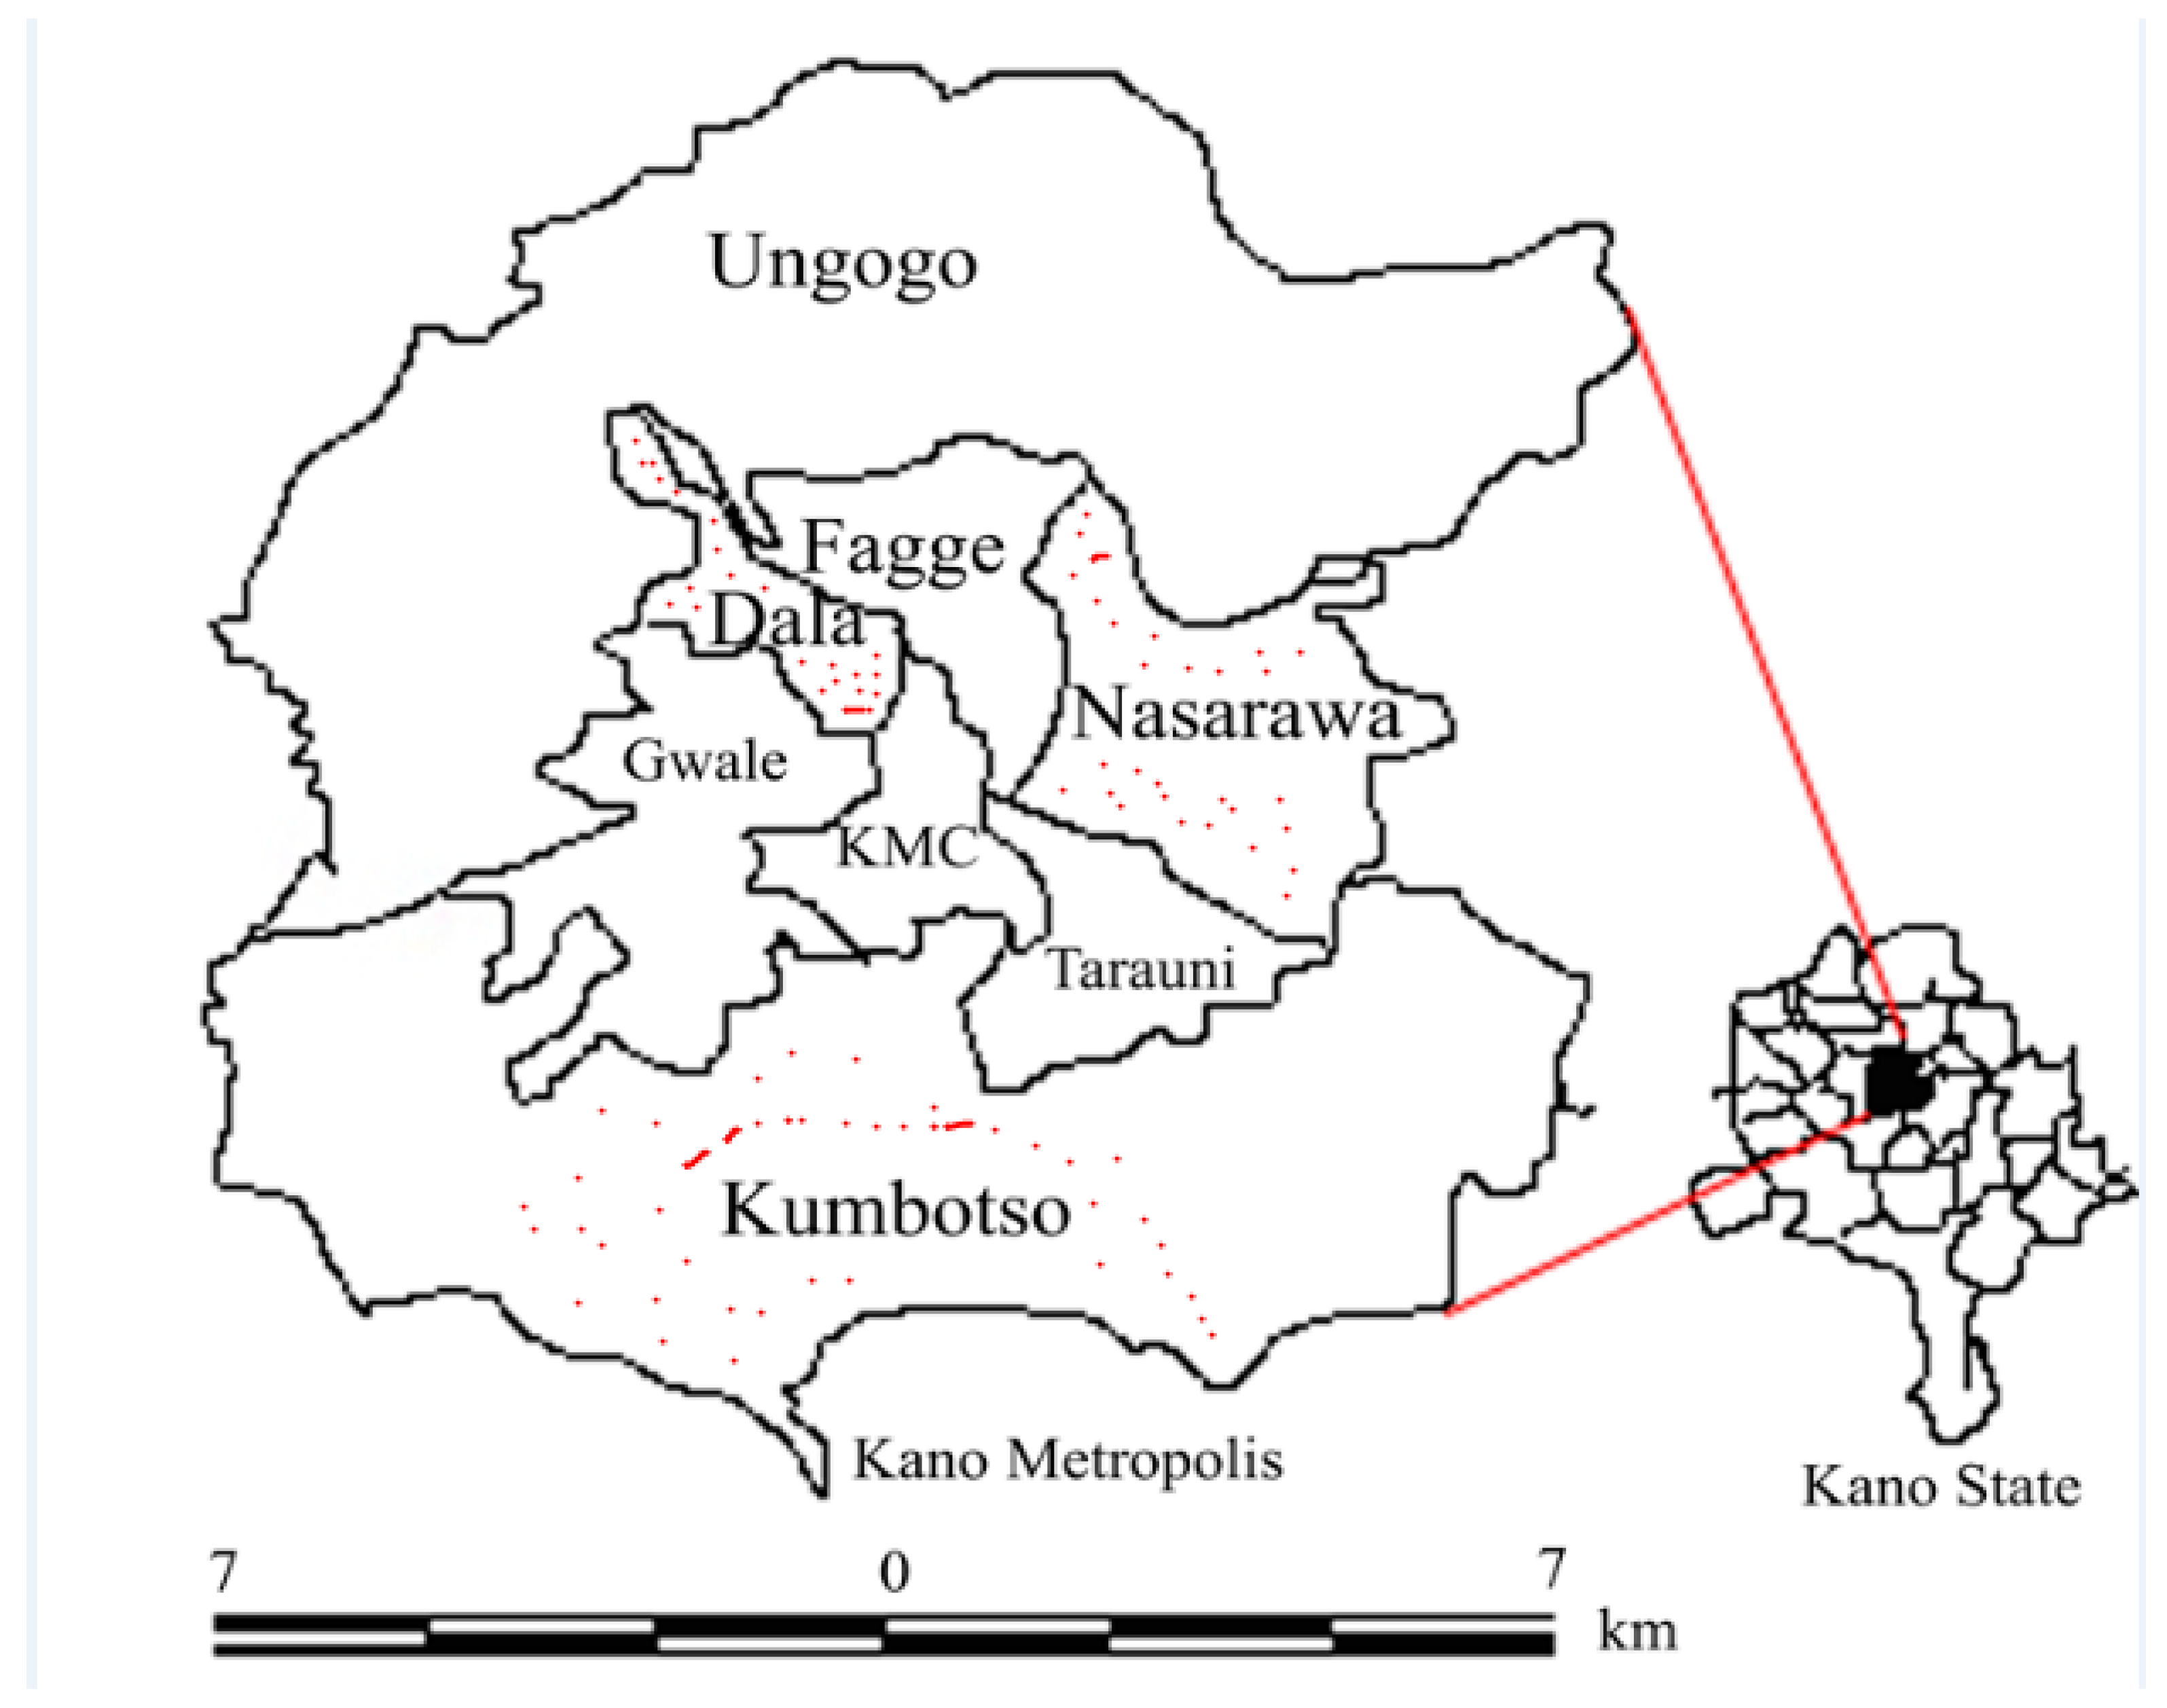 map of kano nigeria